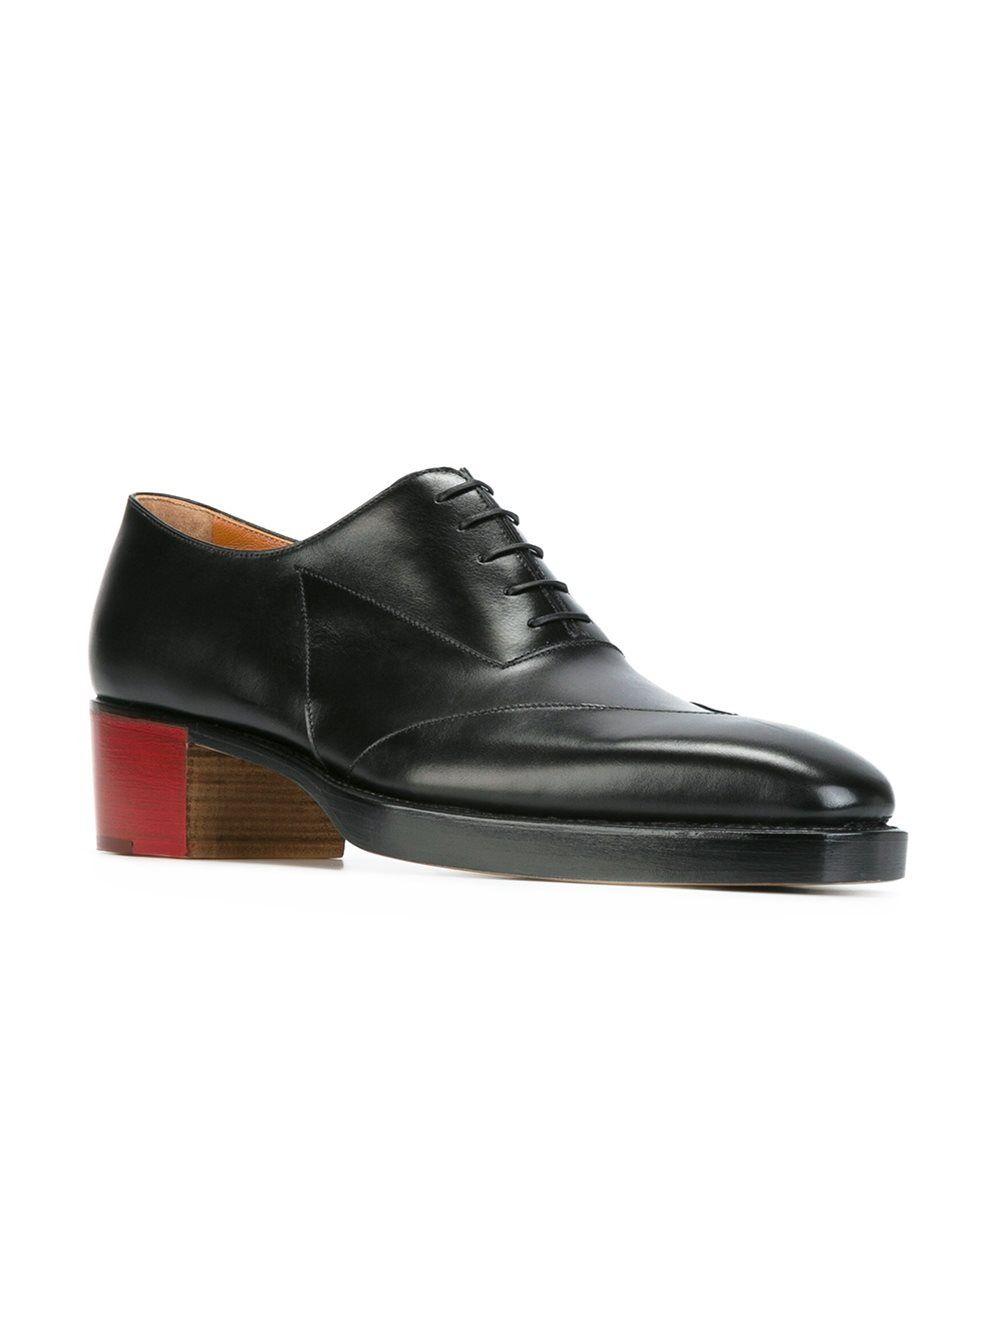 Really Cheap Price Popular Cheap Price FOOTWEAR - Boots Walter Van Beirendonck Free Shipping Footlocker Finishline oiklLX